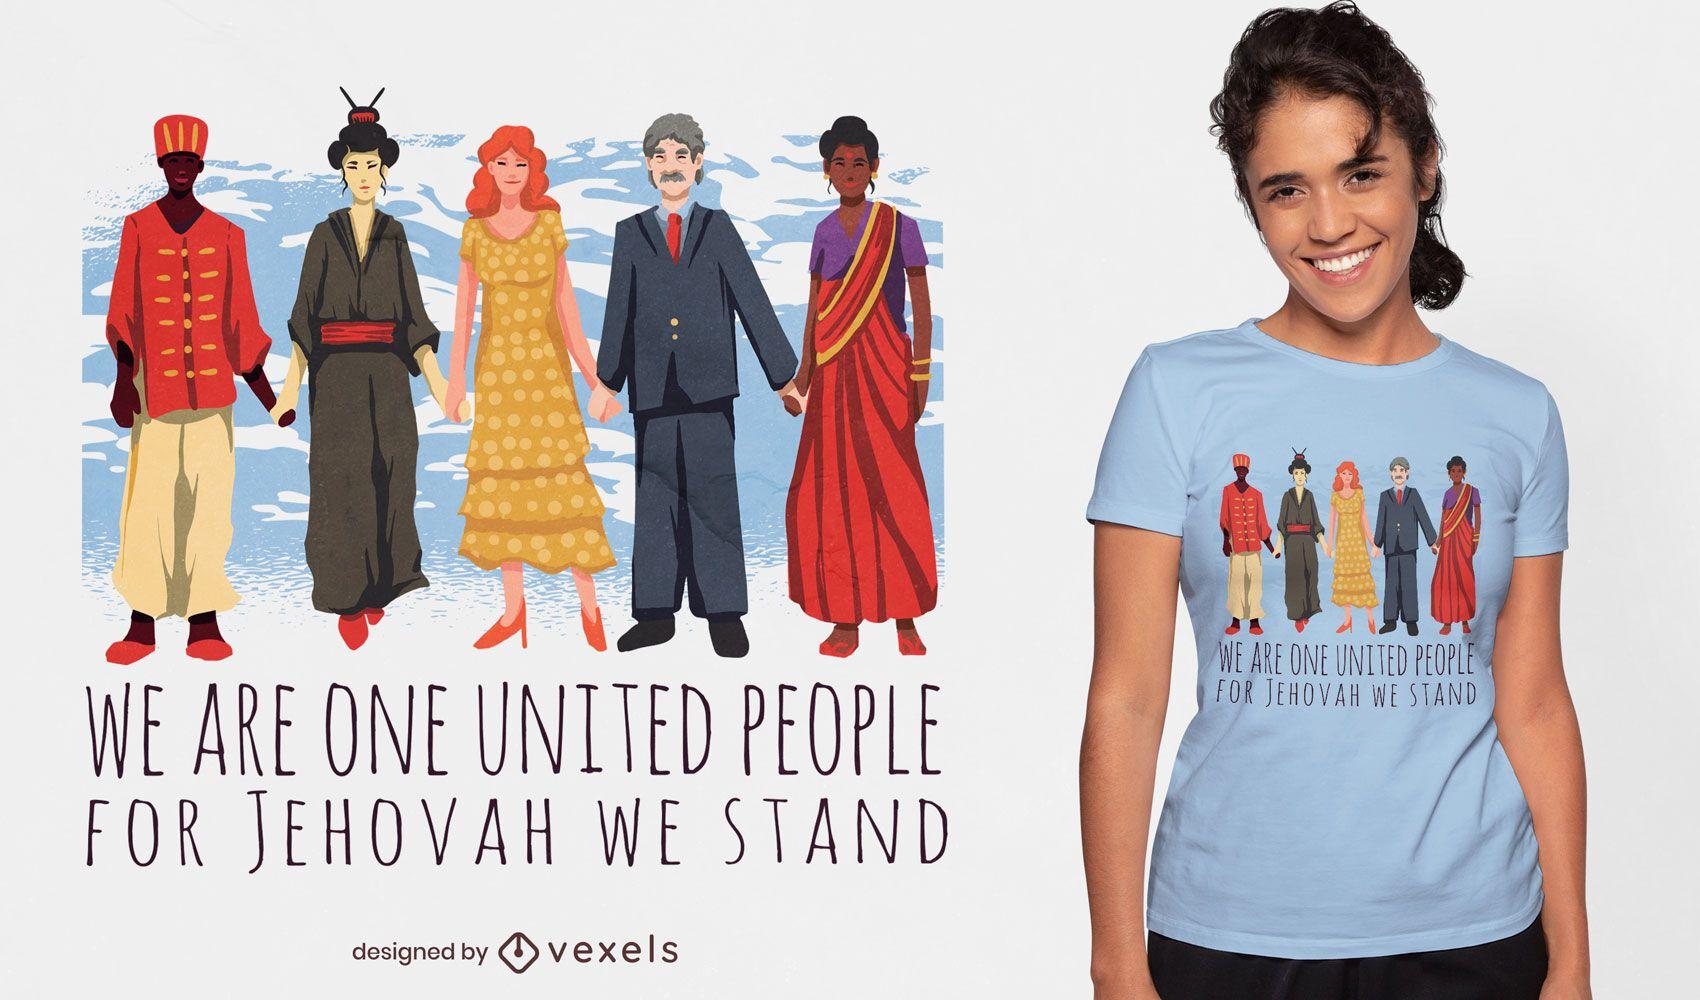 United people culture t-shirt design